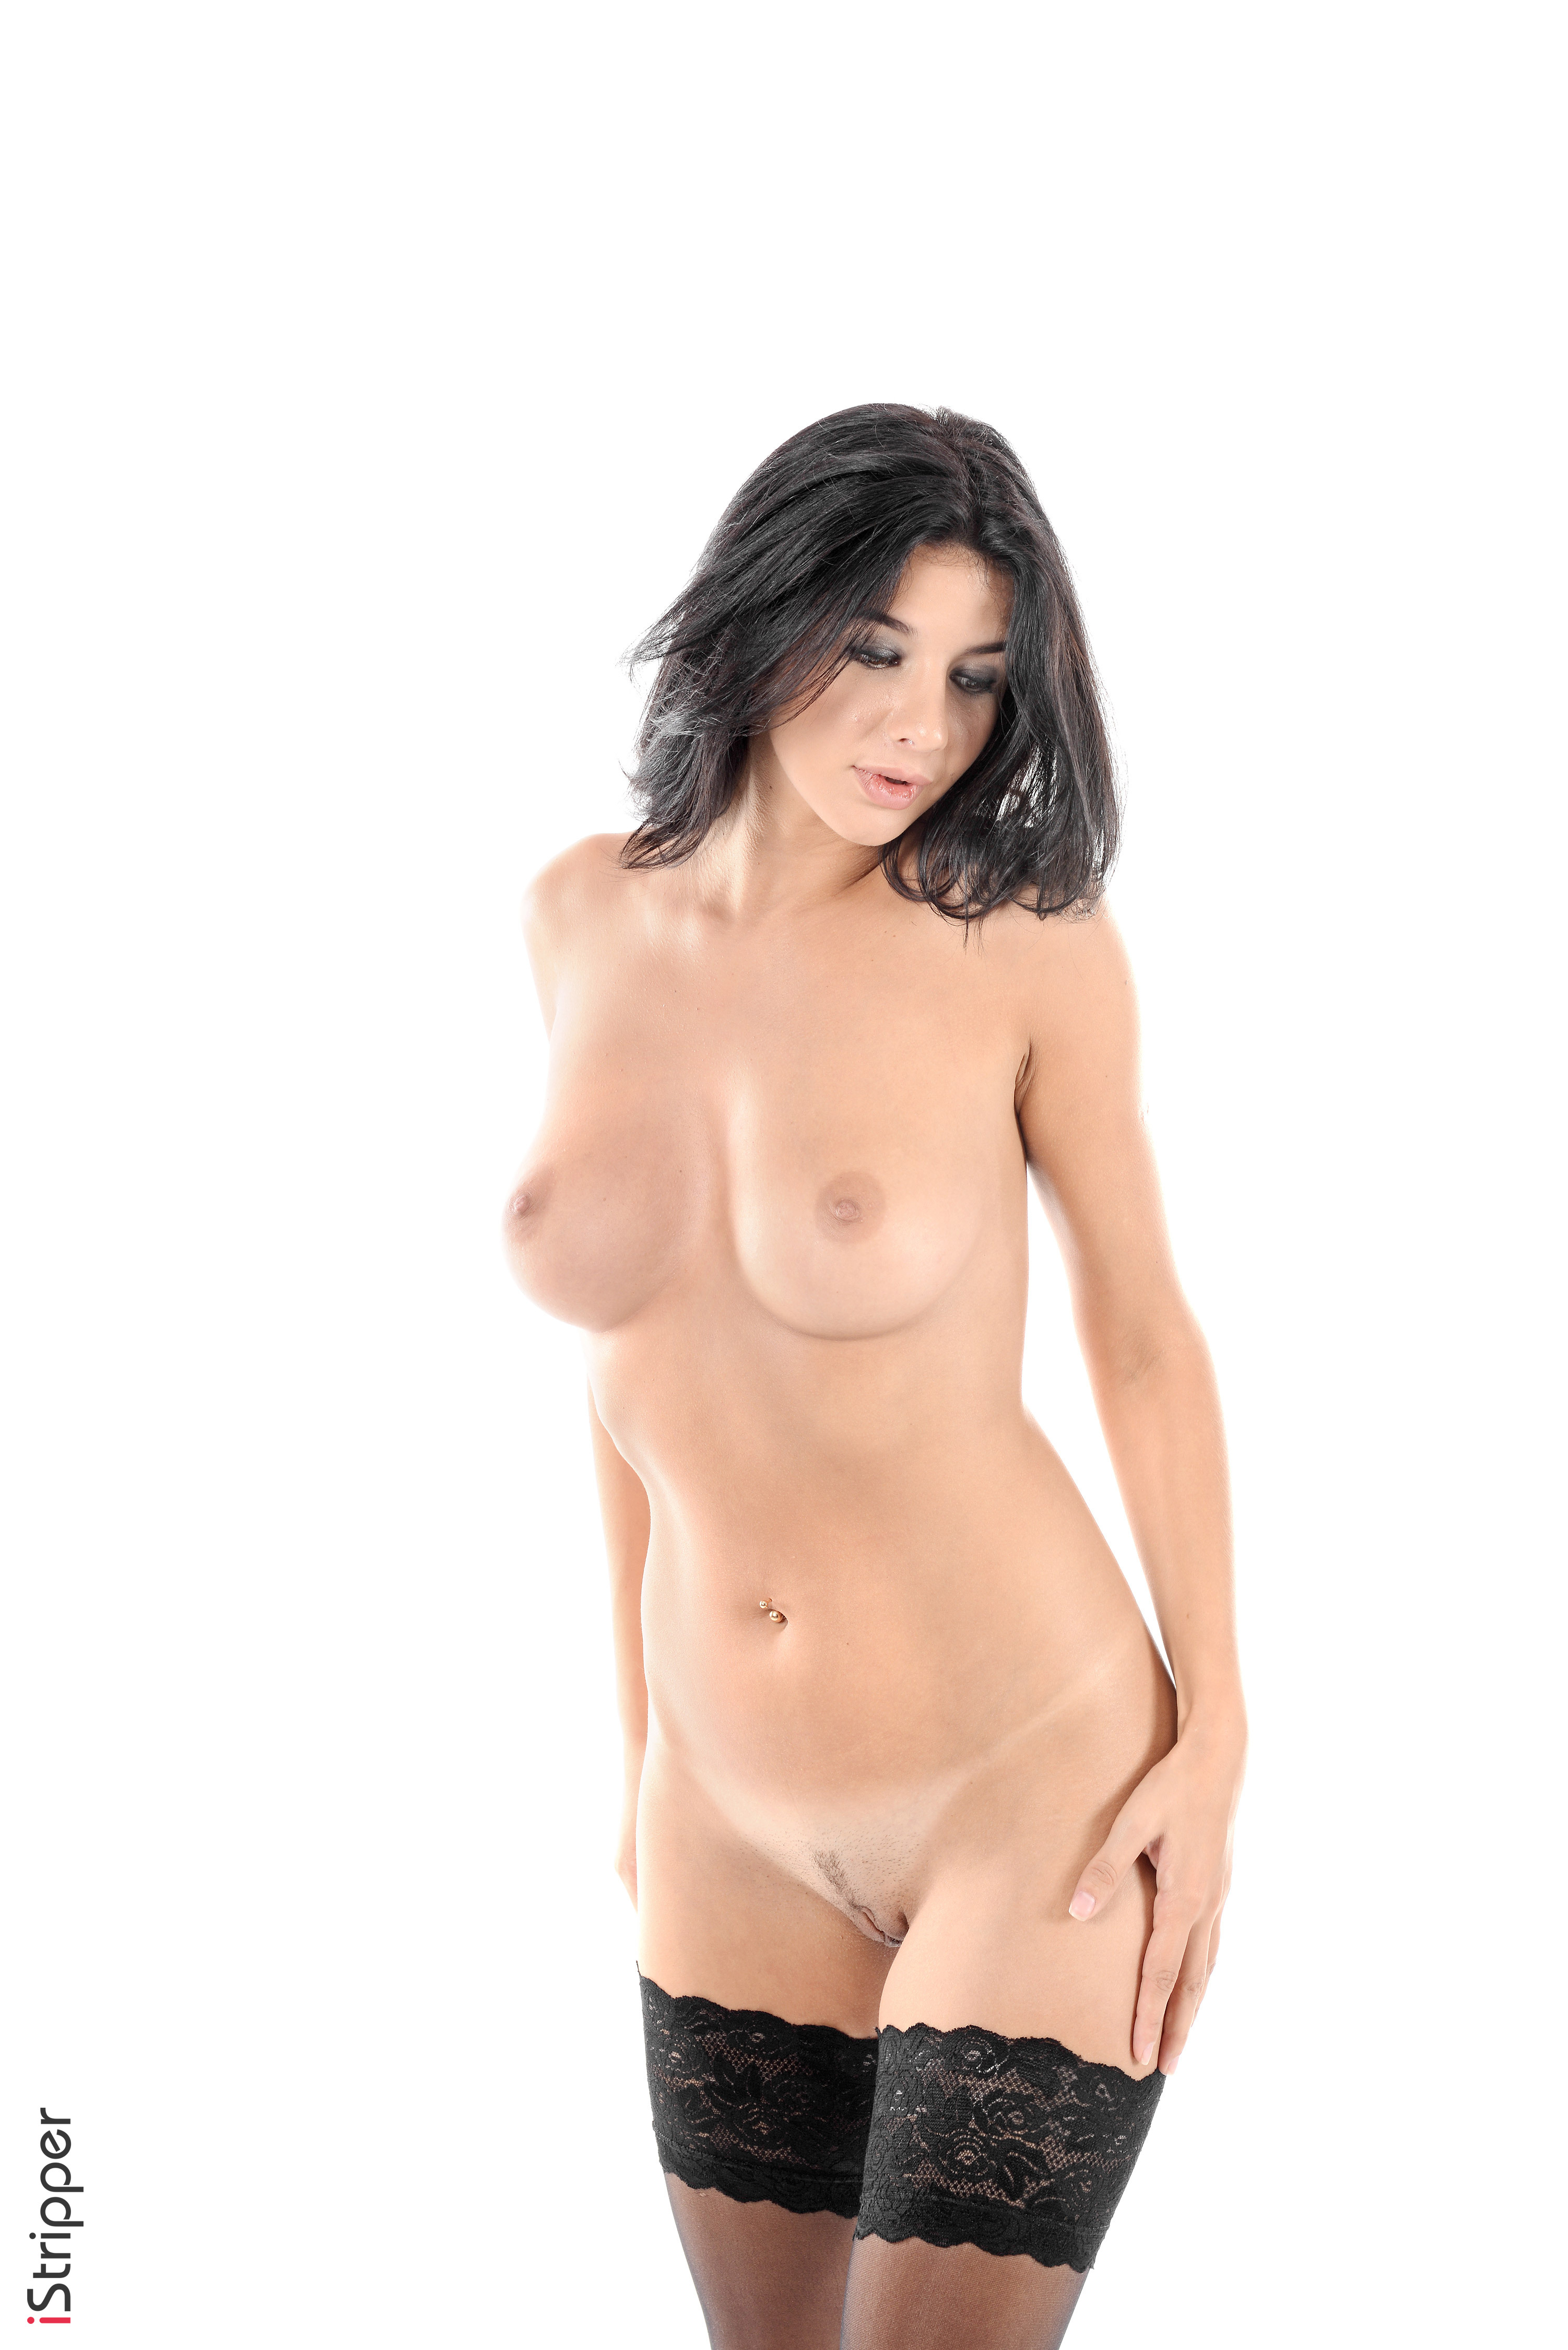 free live porn wallpaper